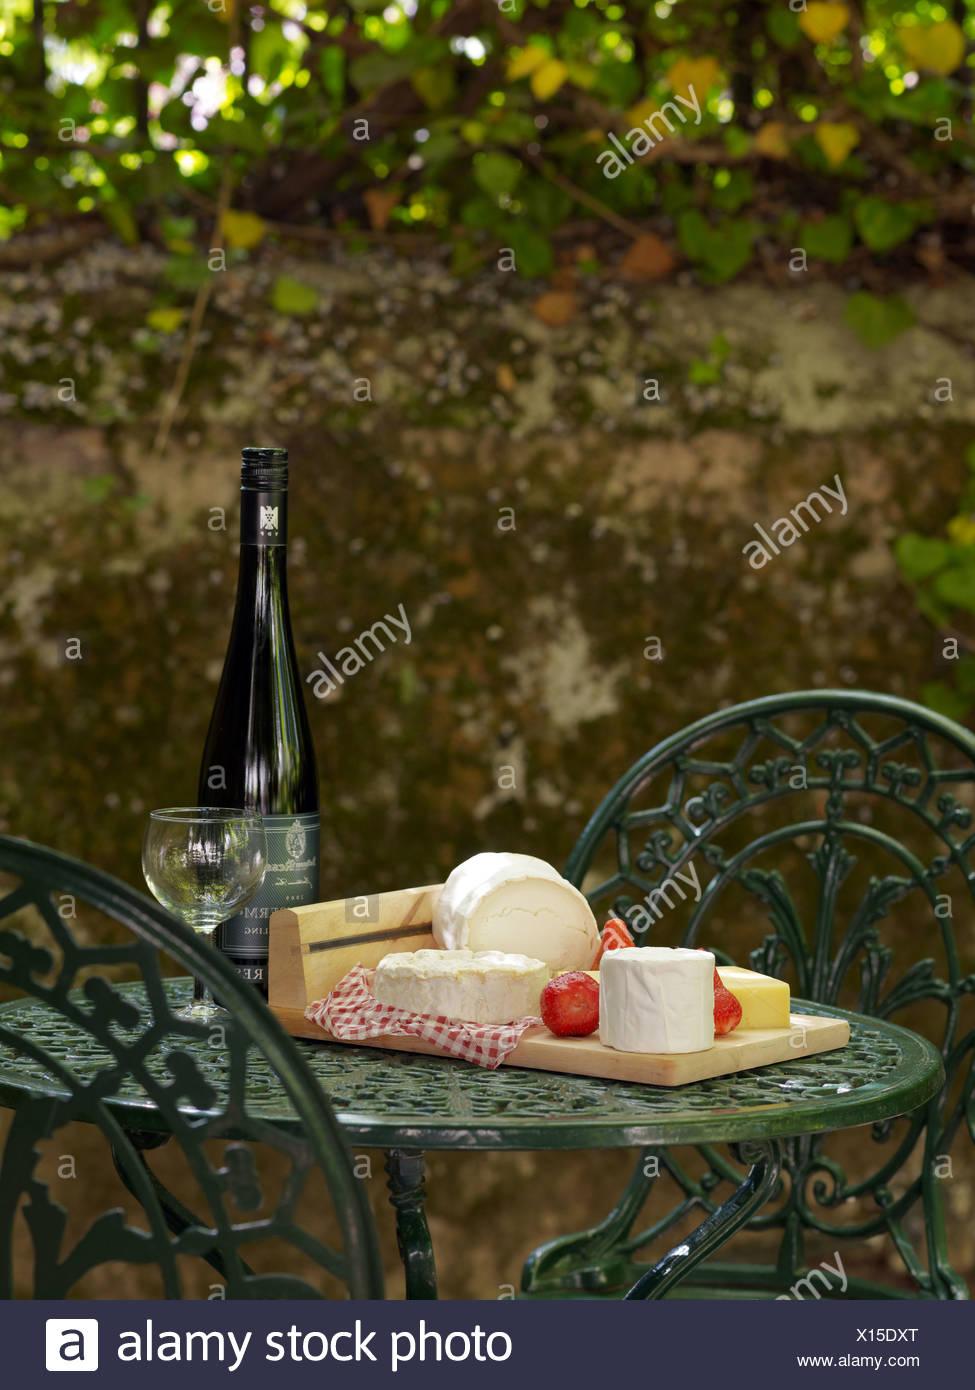 Still Life Cheese Buffet And Wine On A Cast Iron Garden